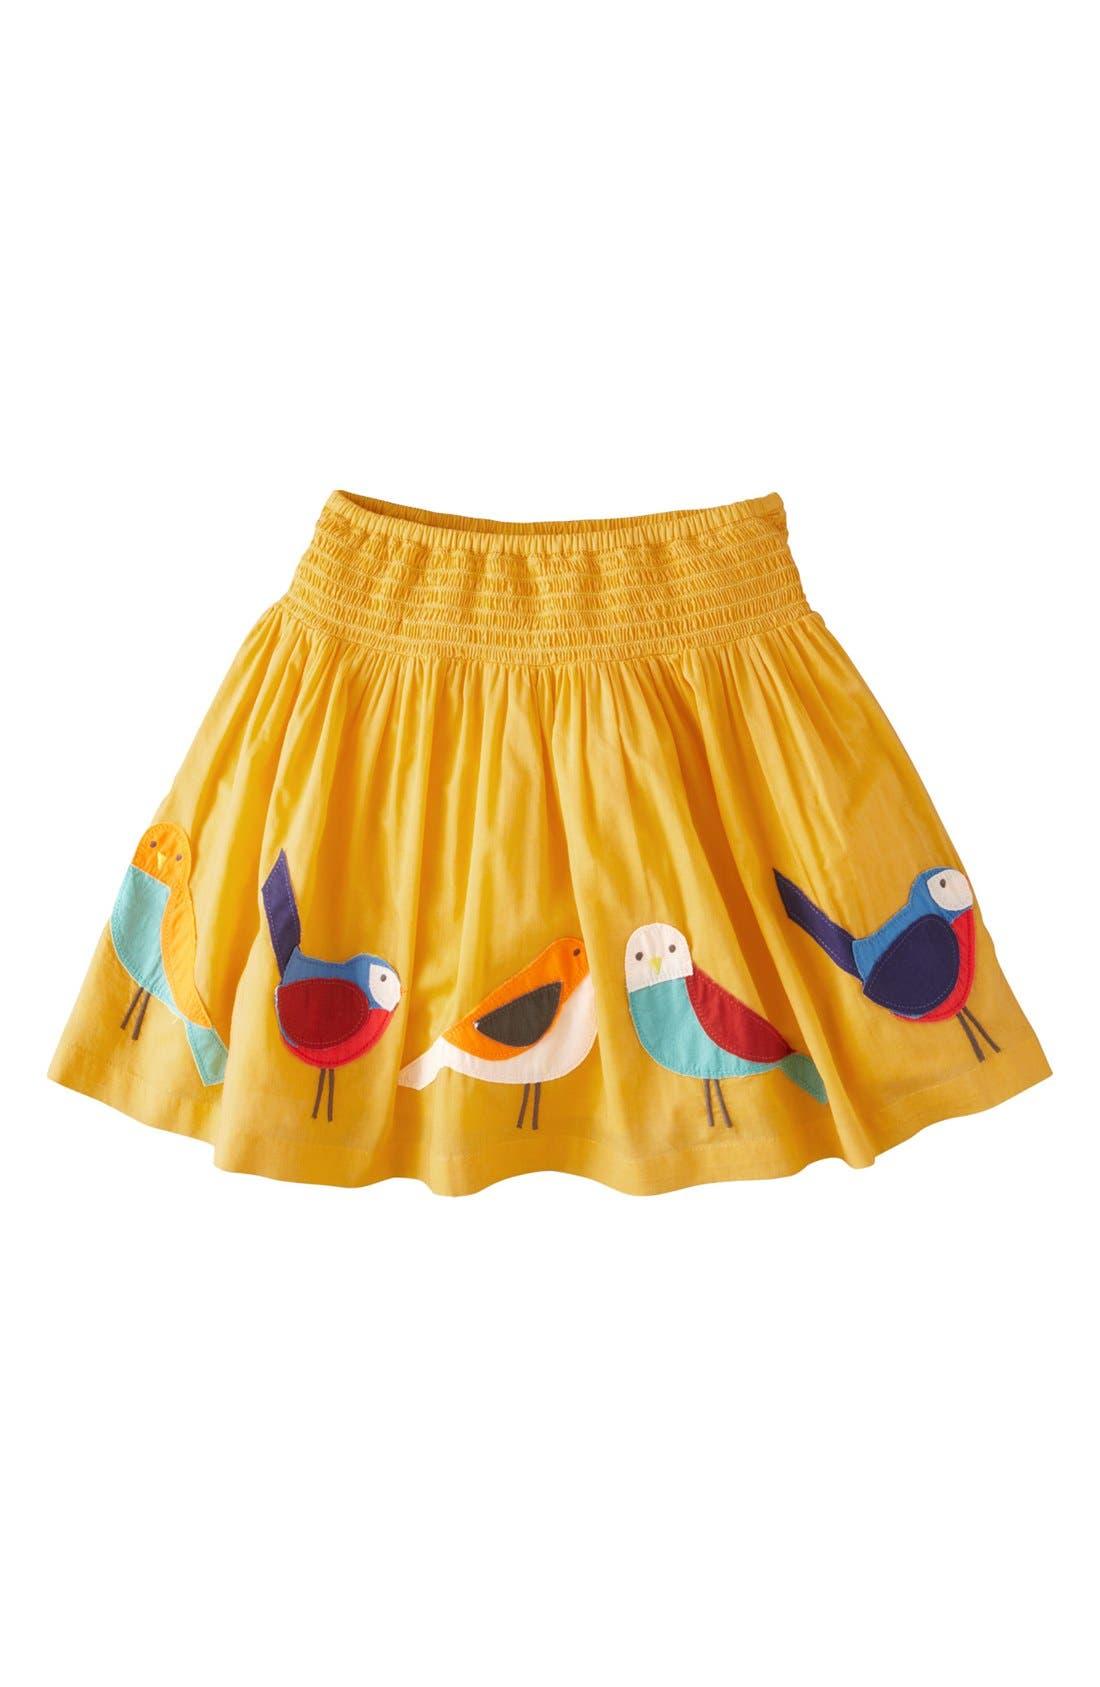 Main Image - Mini Boden 'Decorative' Cotton Voile Skirt (Toddler Girls, Little Girls & Big Girls)